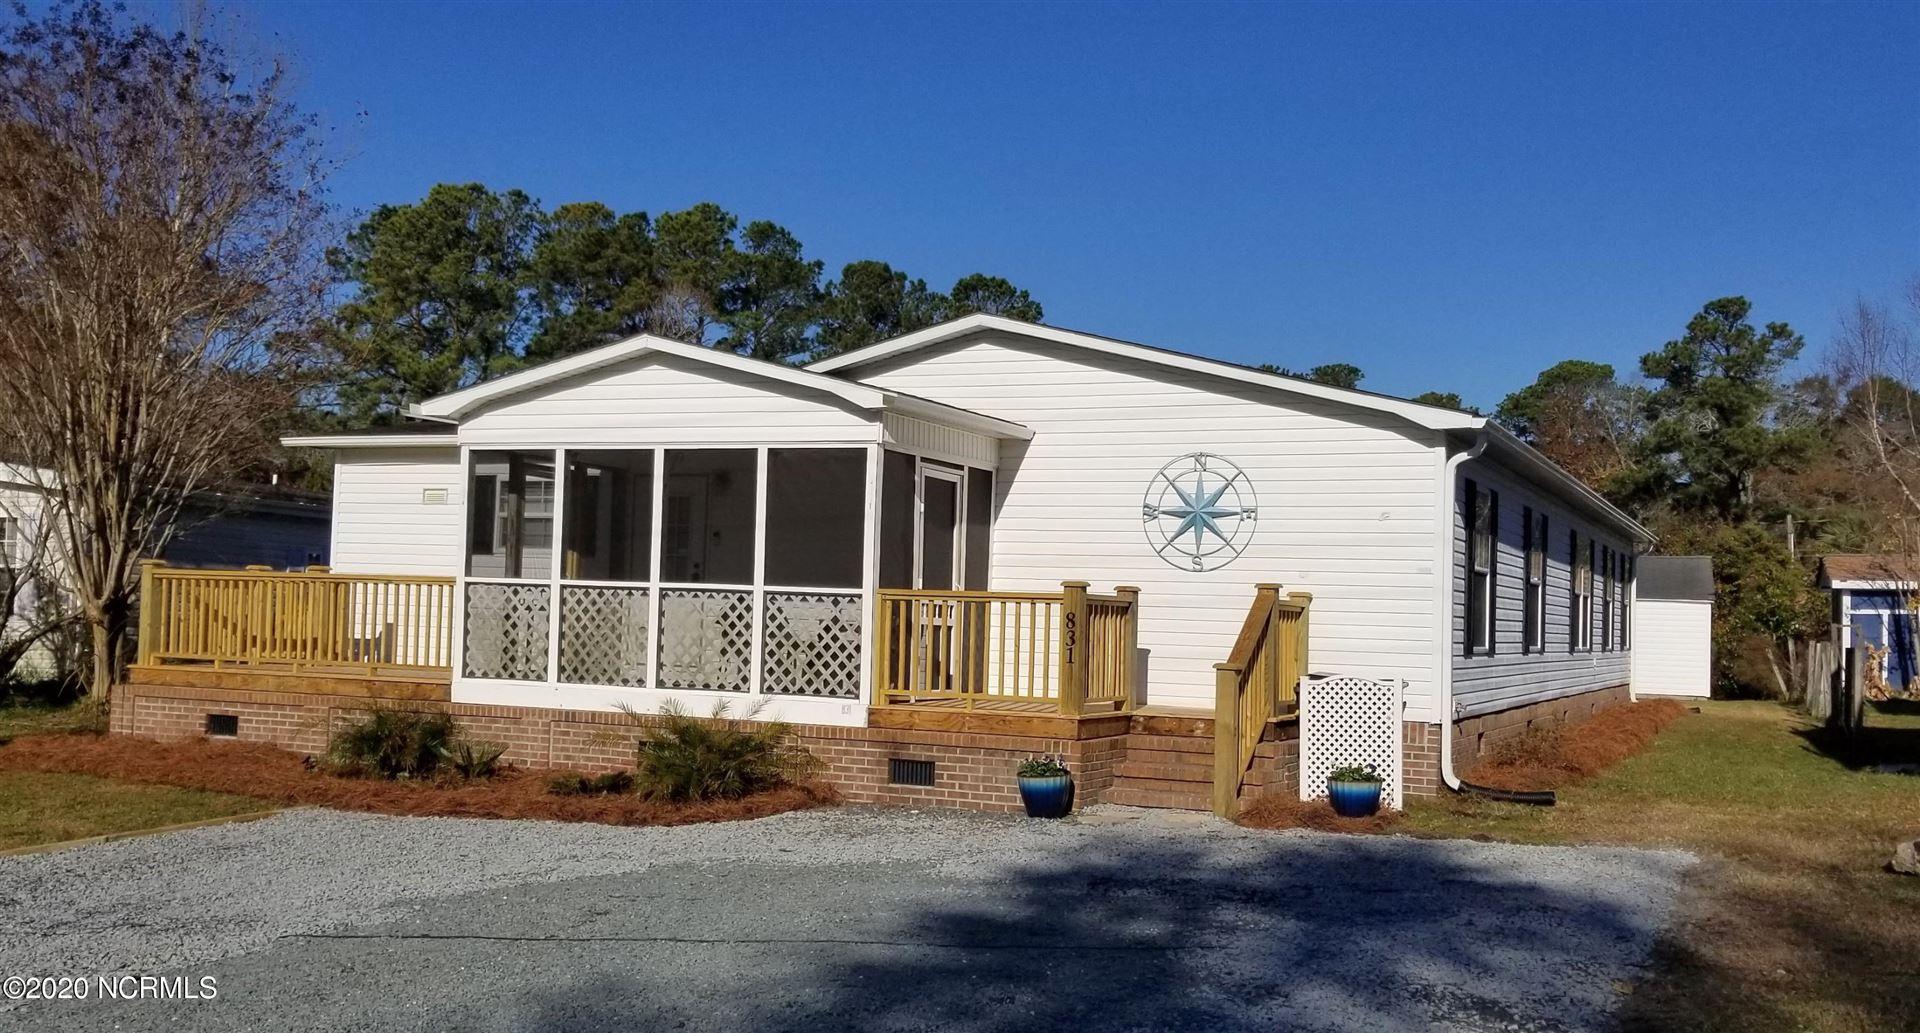 Photo of 831 Magnolia Drive, Sunset Beach, NC 28468 (MLS # 100296432)